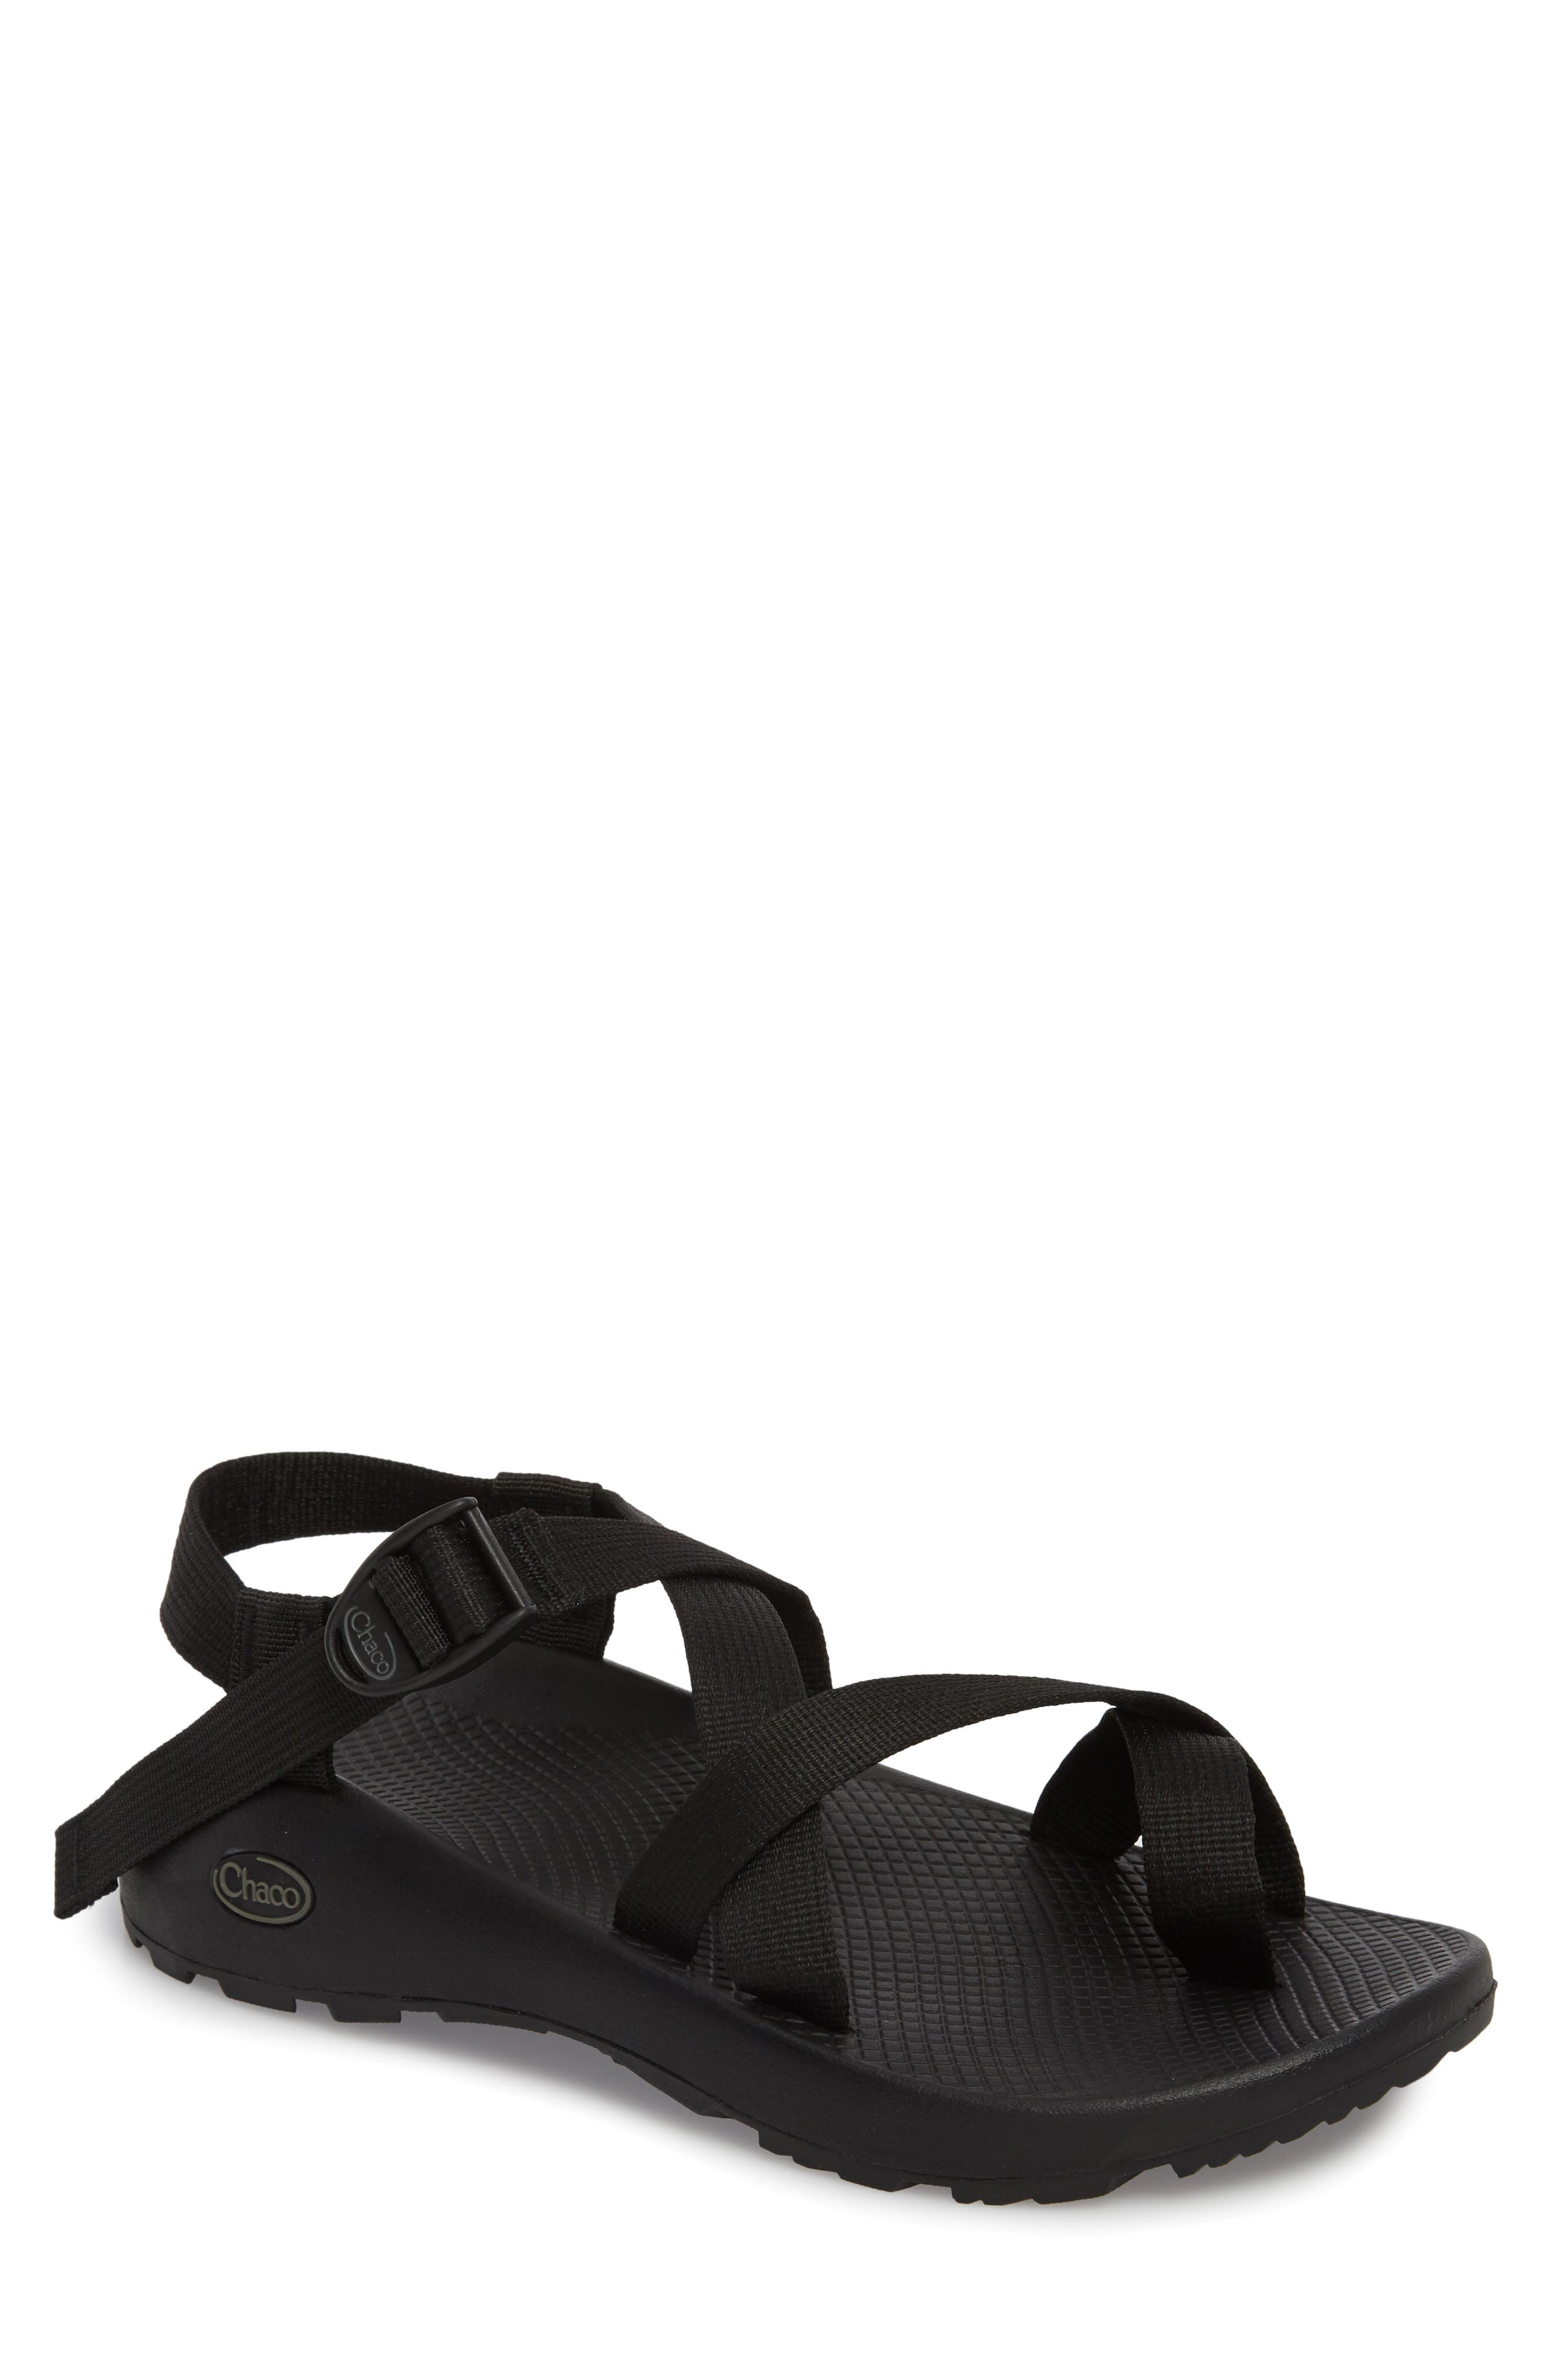 Z/2 Classic Sport Sandal